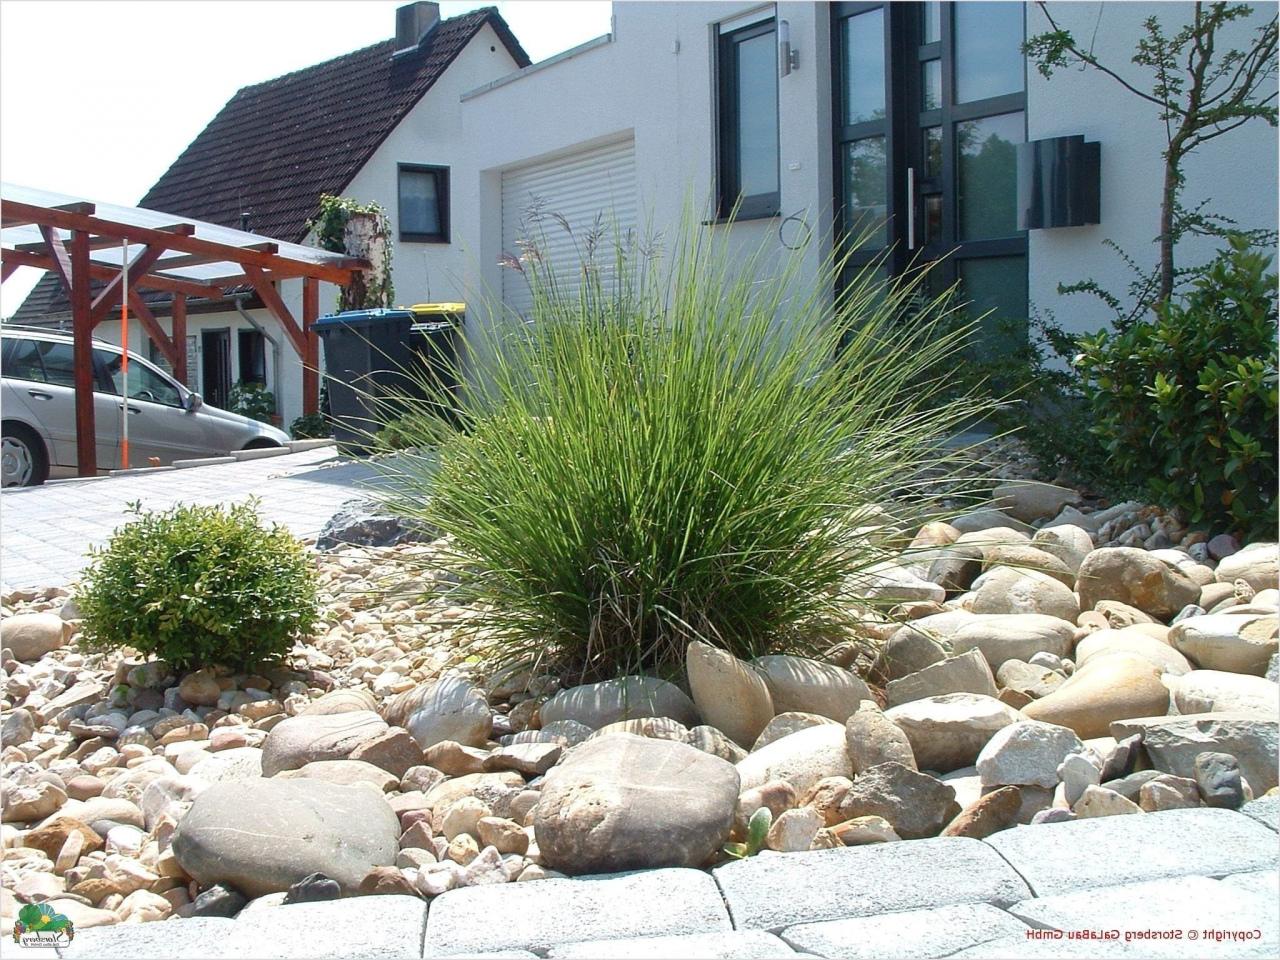 Ideen Garten Best Of Landscaping with Rocks — Procura Home Blog